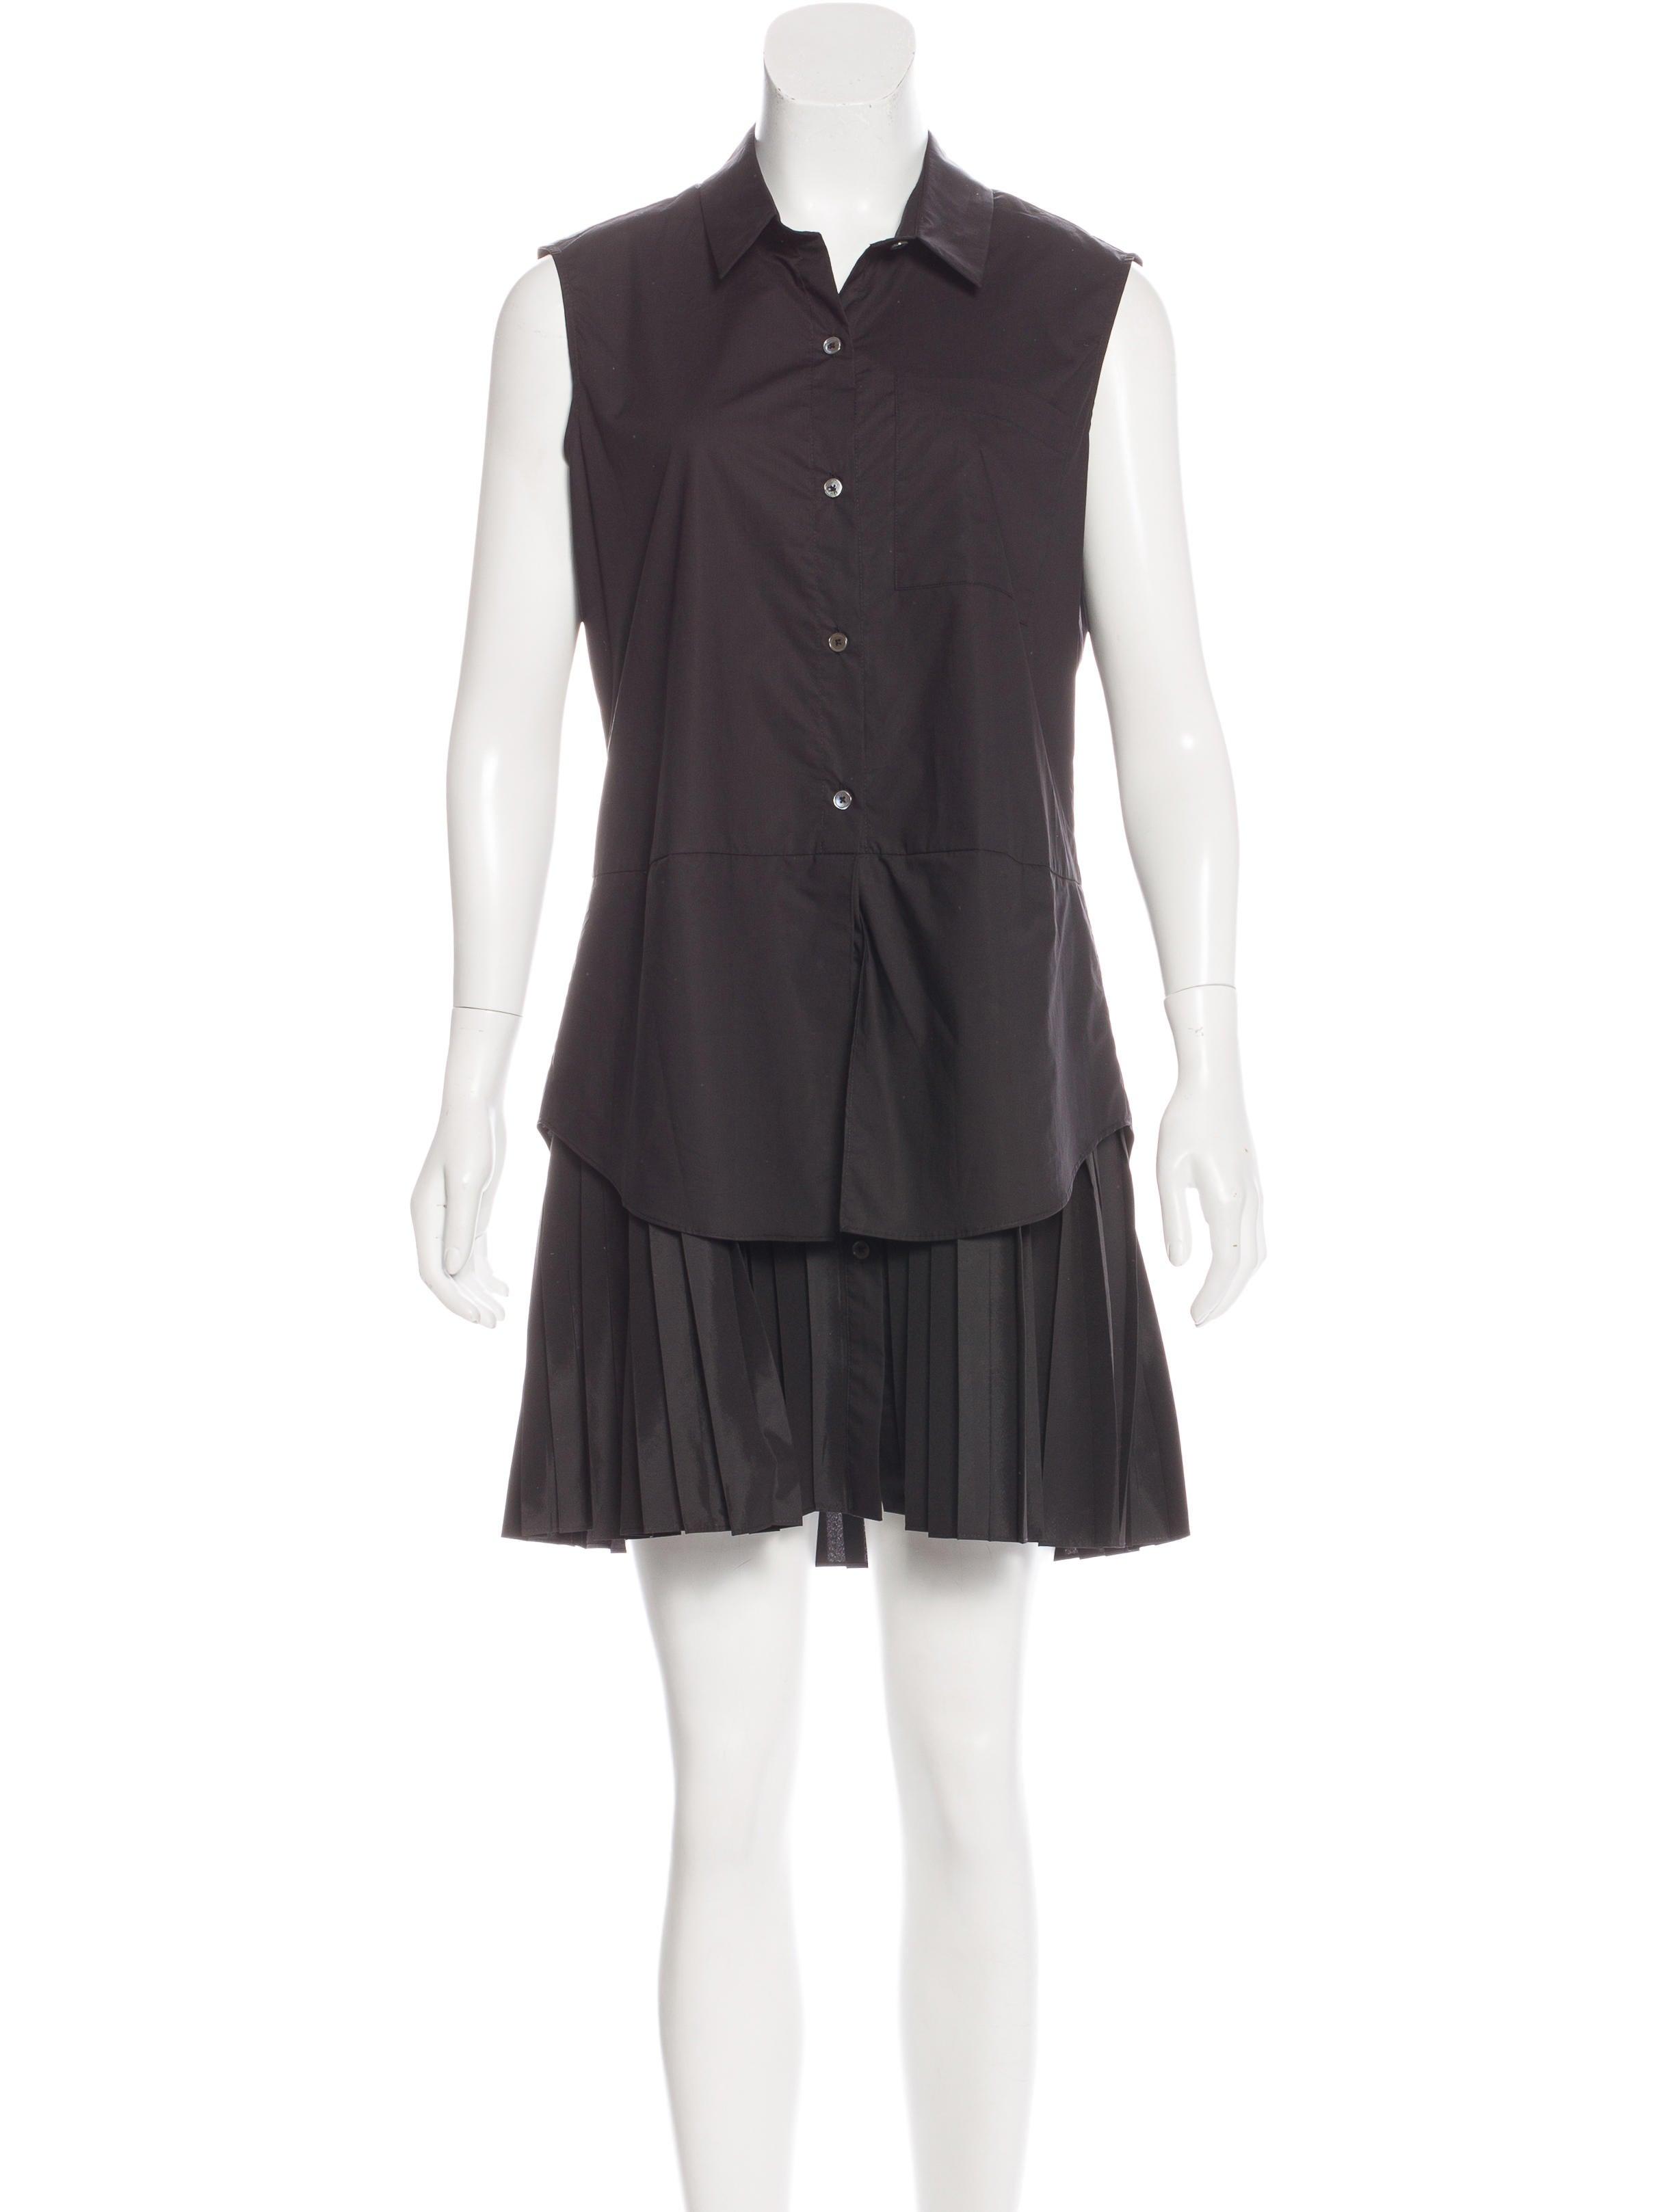 Derek lam 10 crosby pleated shirt dress w tags clothing for Black pleated dress shirt